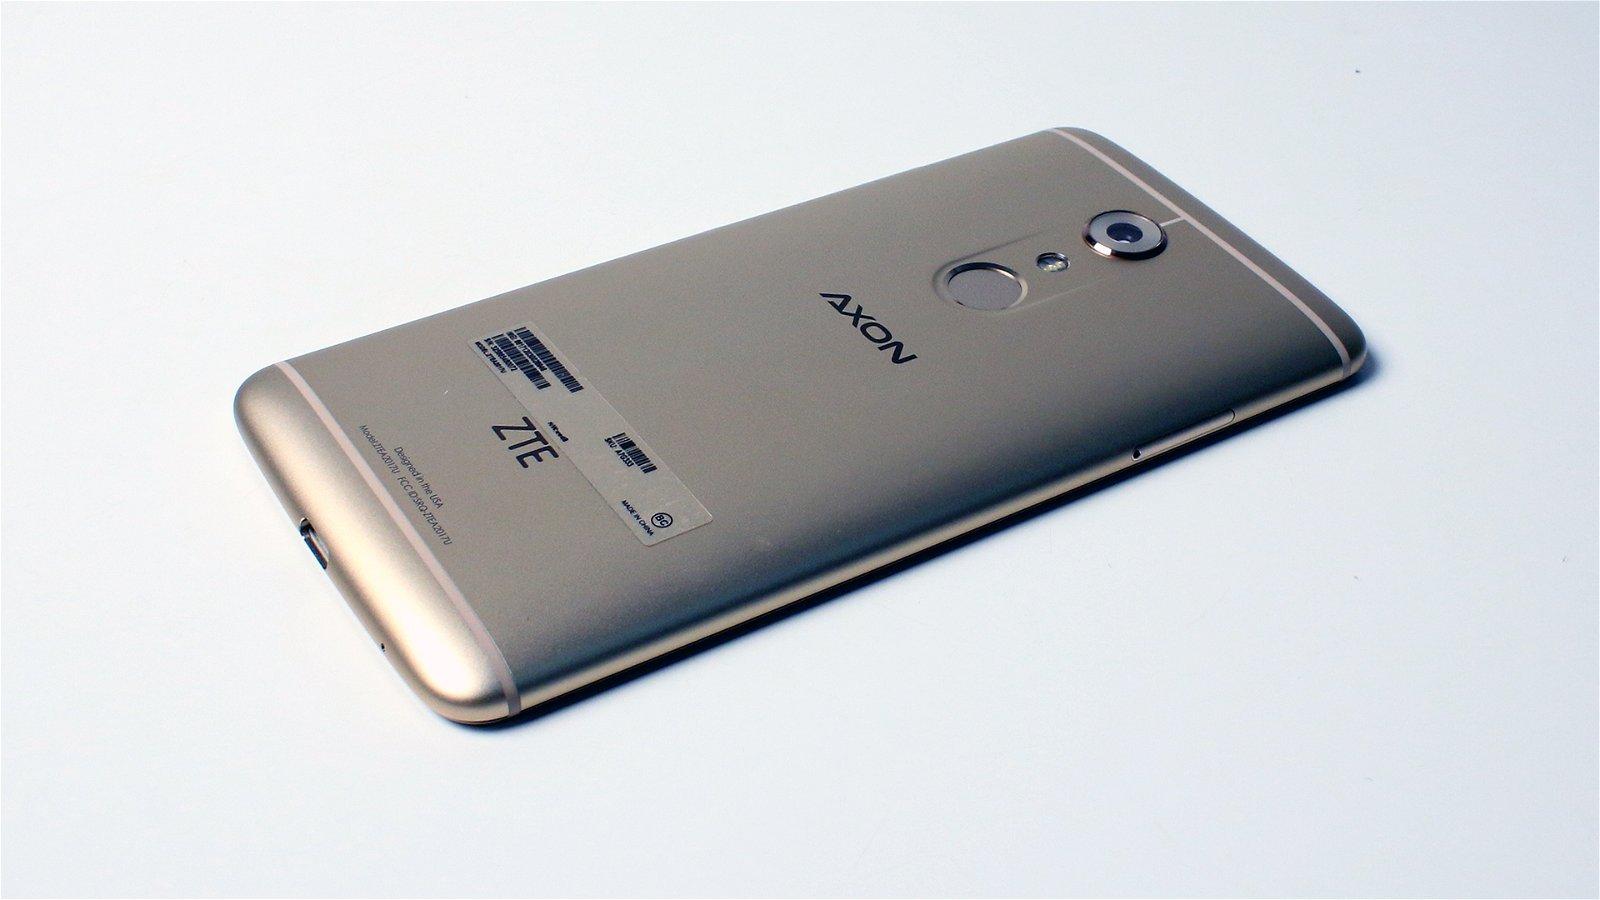 Zte Axon 7 (Phone) Review 4